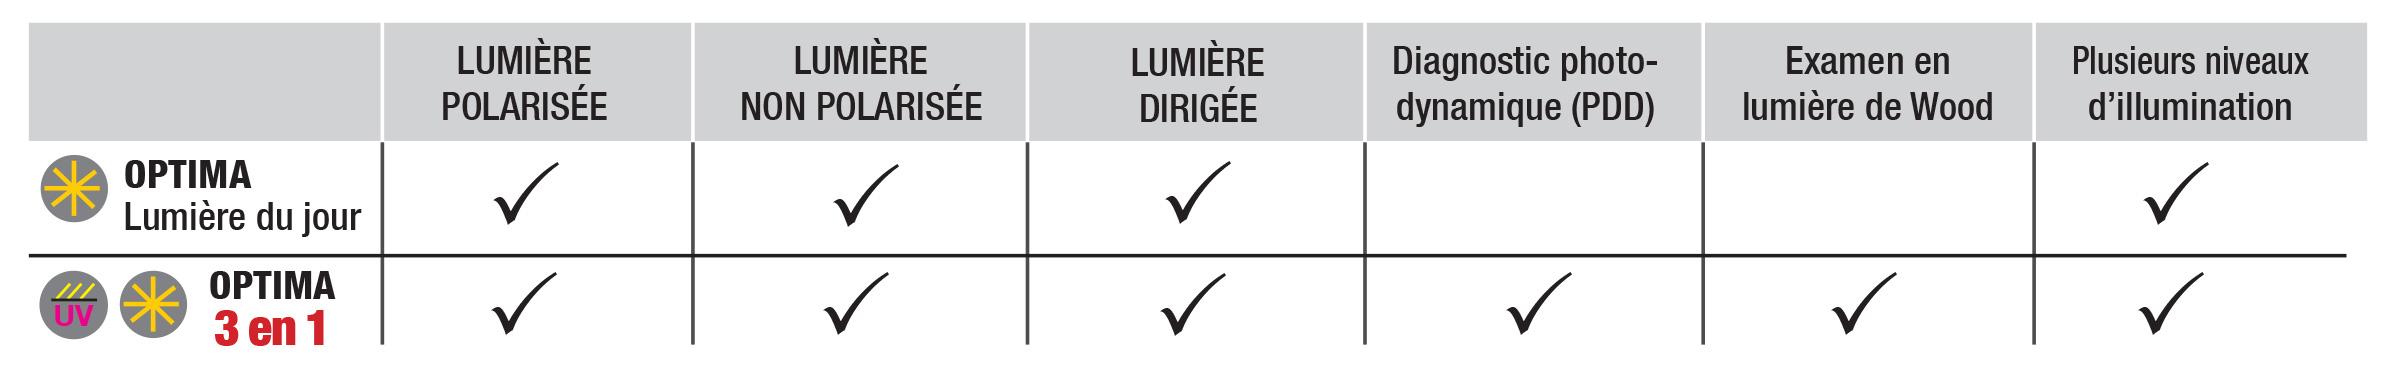 Tableau descriptif